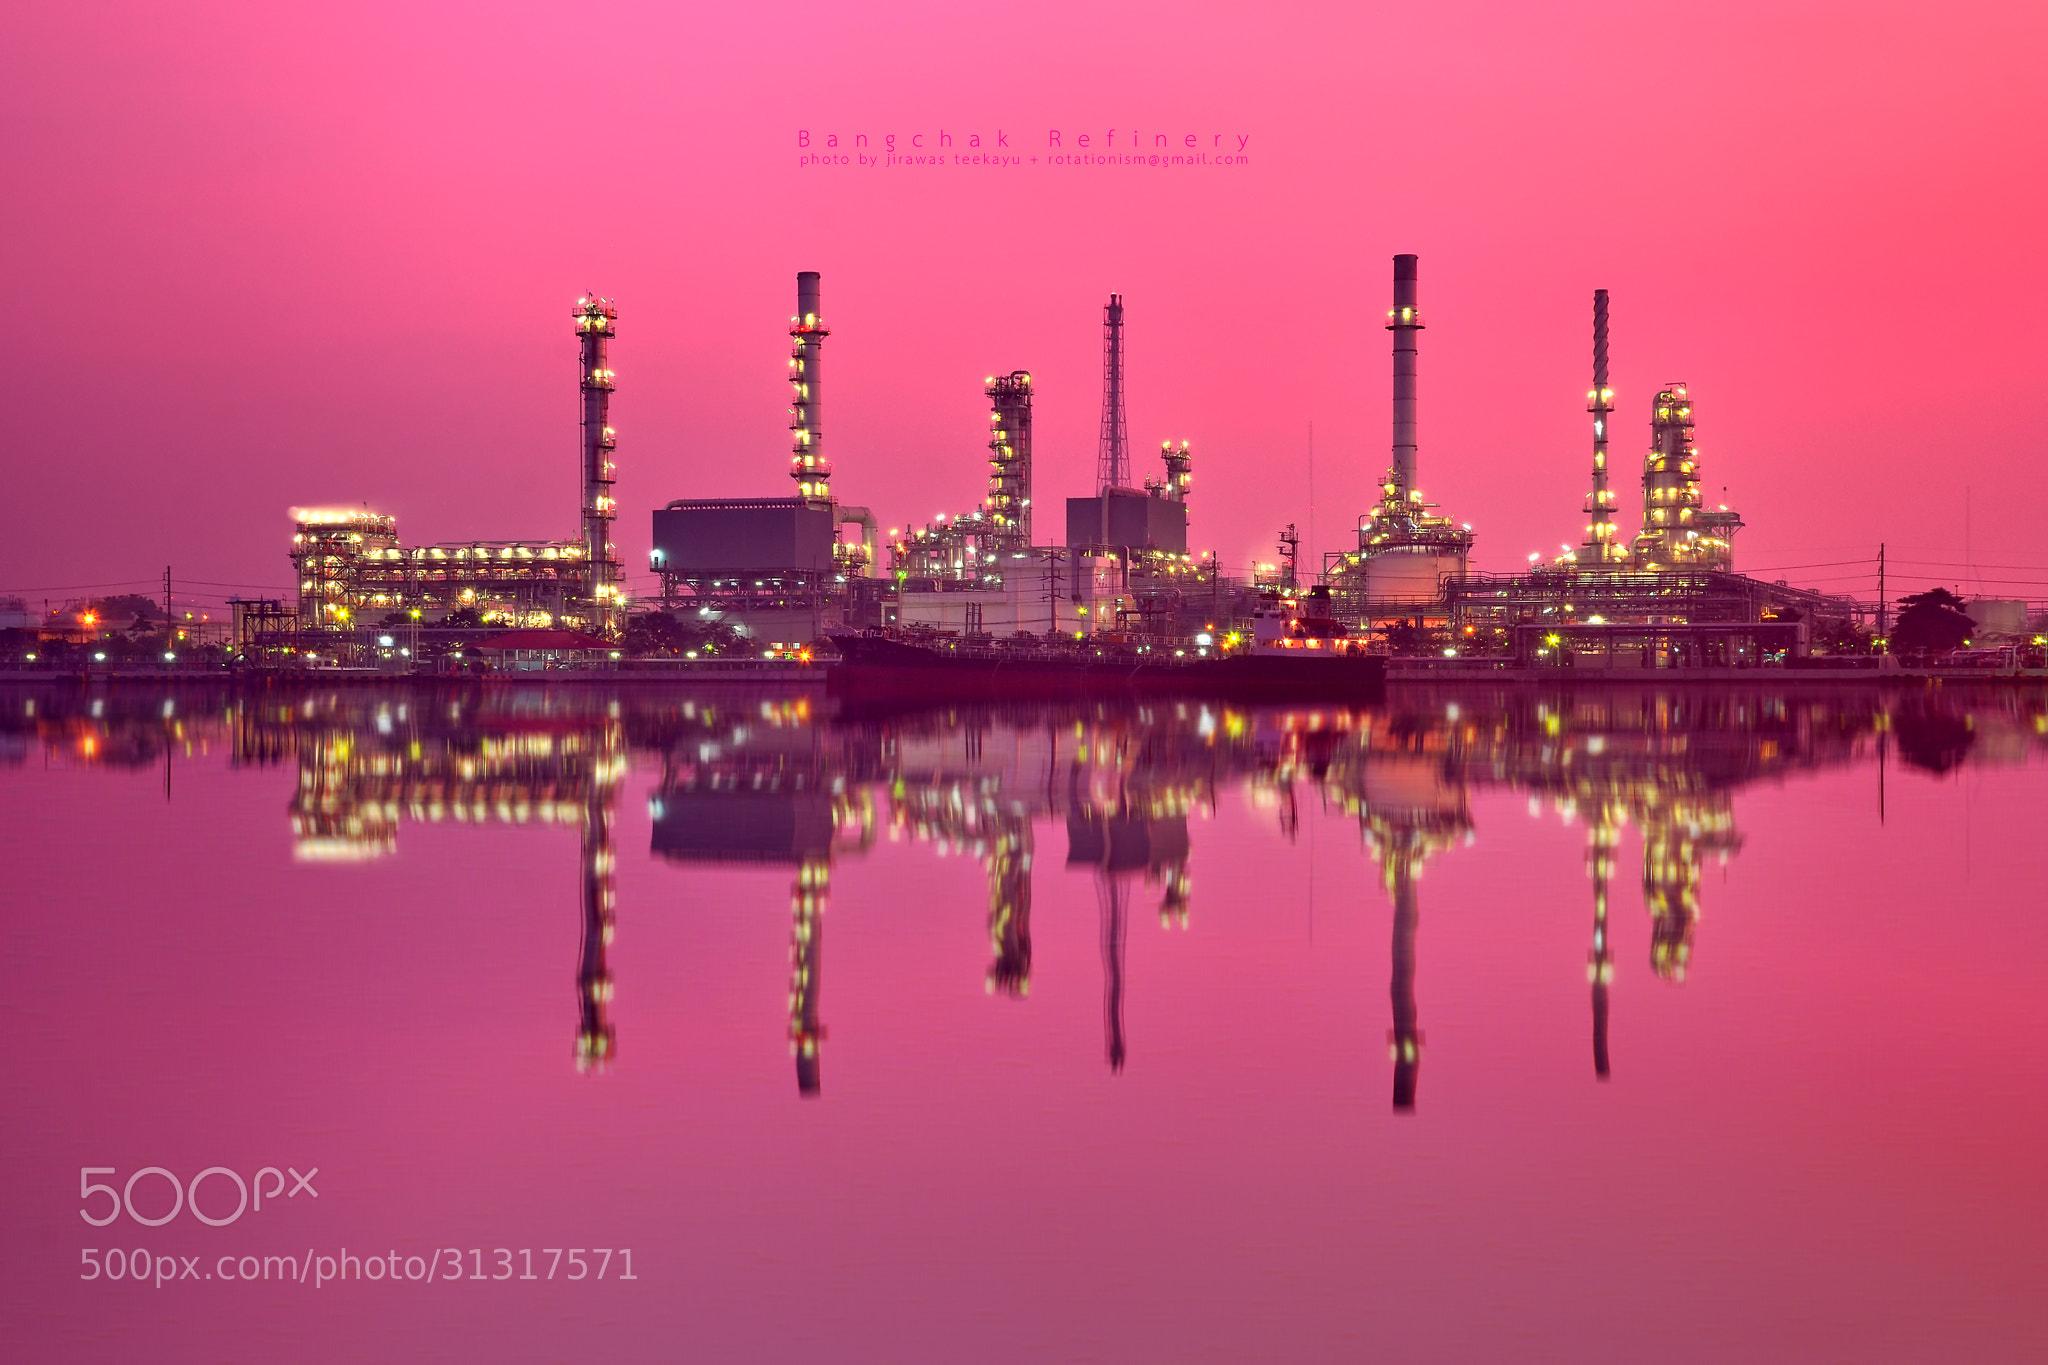 Photograph Pinkfinery by Jirawas Teekayu on 500px